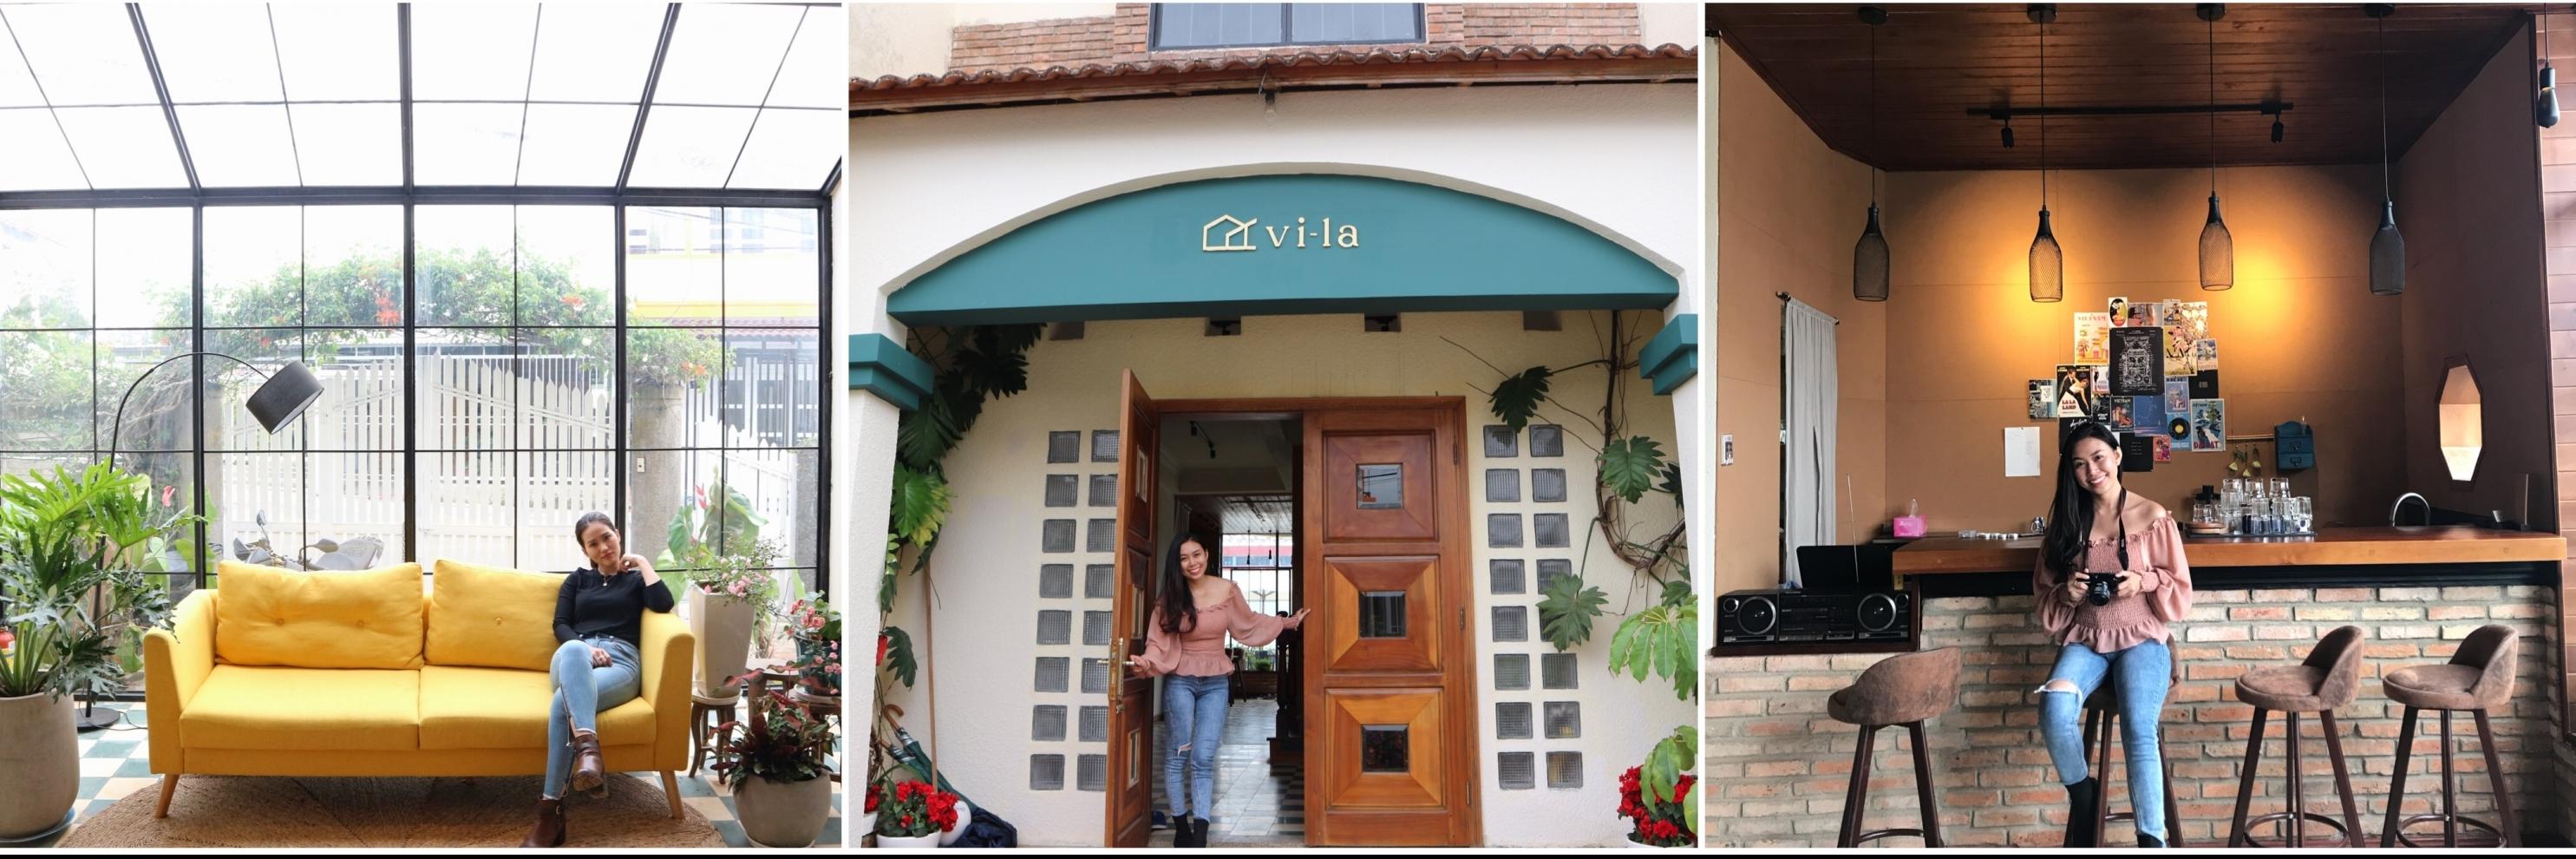 https://gody.vn/blog/hothikieutrinh8470/post/vi-la-homestay-cafe-moi-toanh-giua-long-thanh-pho-da-lat-1689